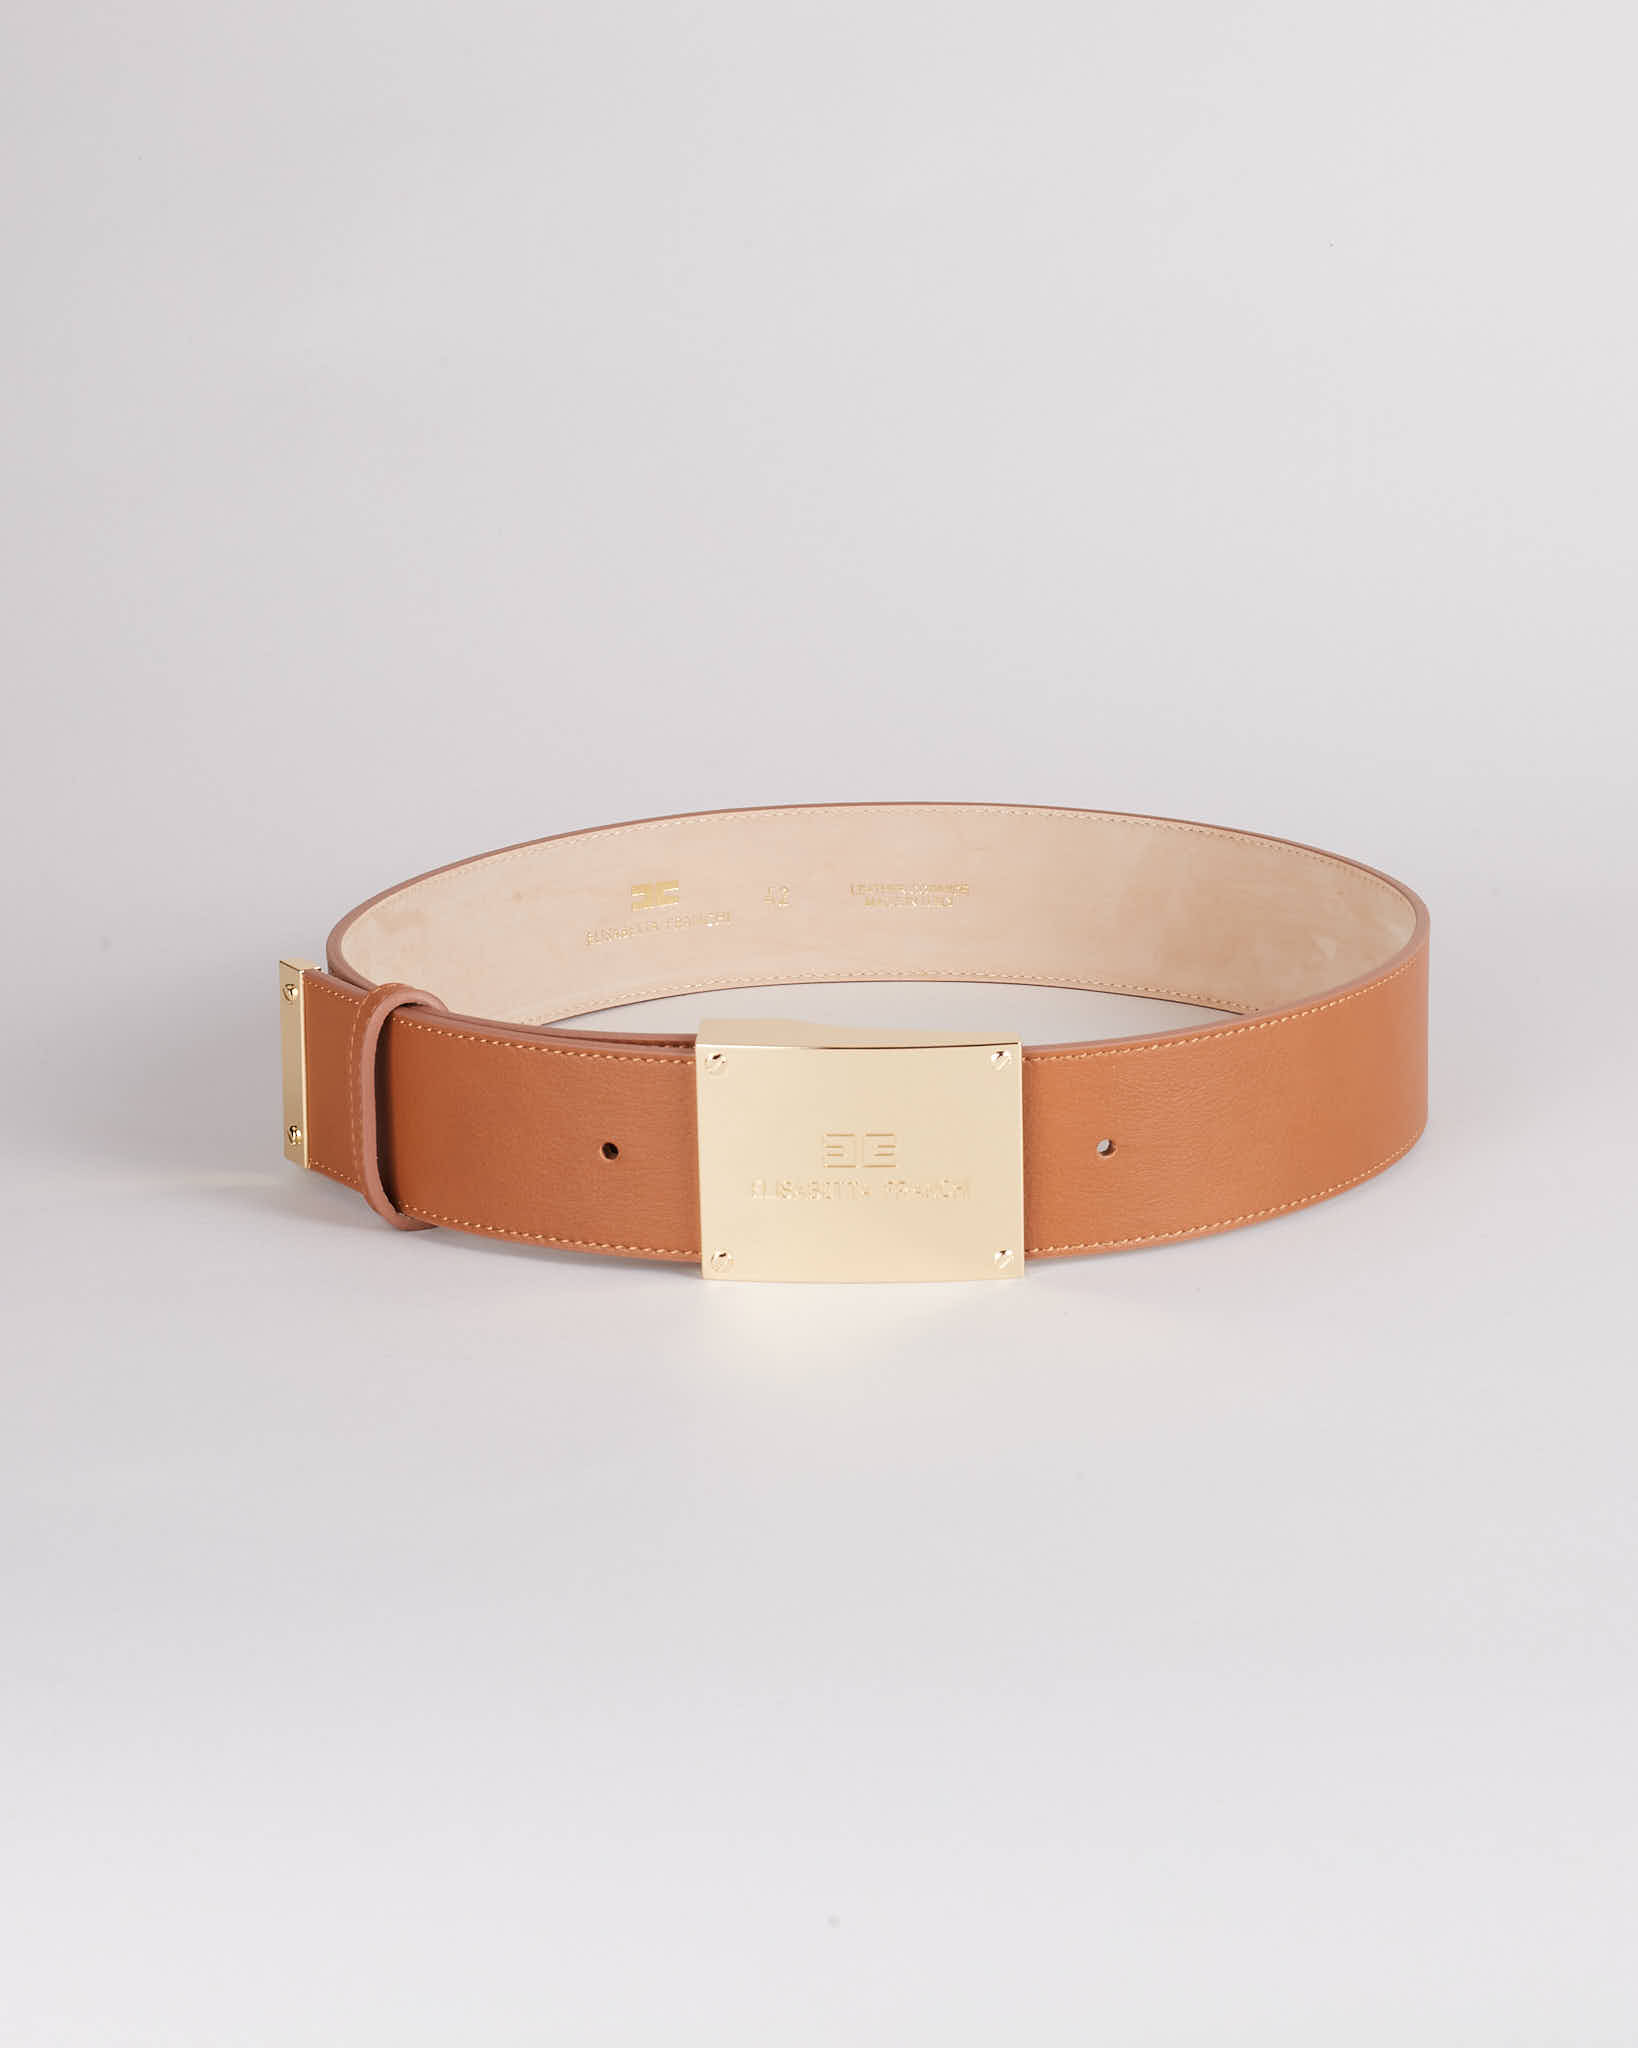 Cintura alta con fibbia Elisabetta Franchi ELISABETTA FRANCHI   Cintura   CT02S16E2600